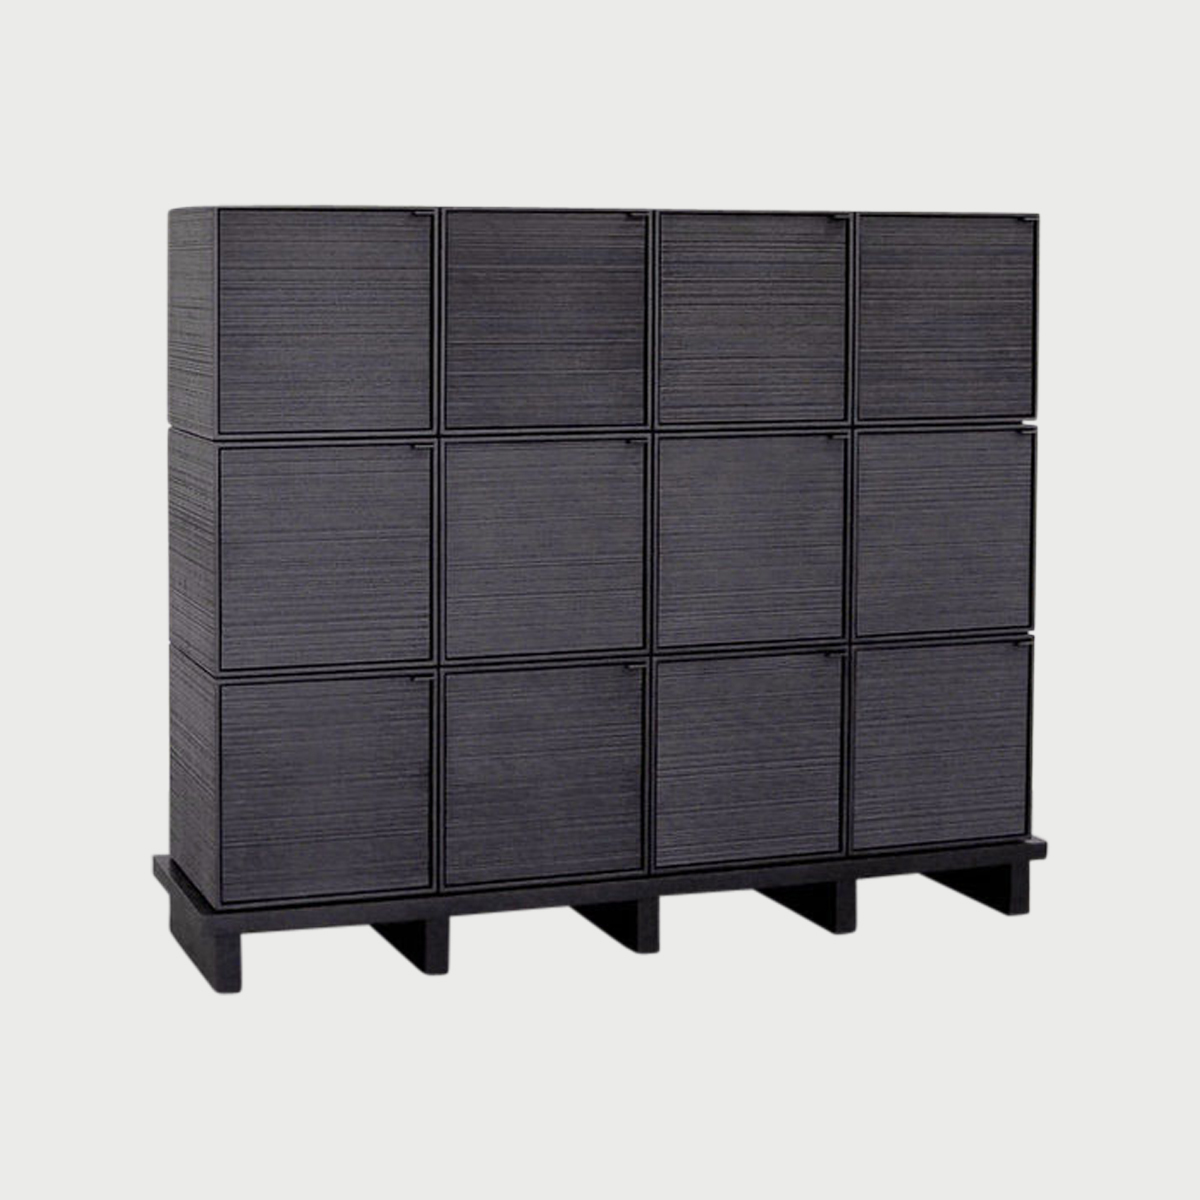 12 cubes chest of doors copy 2